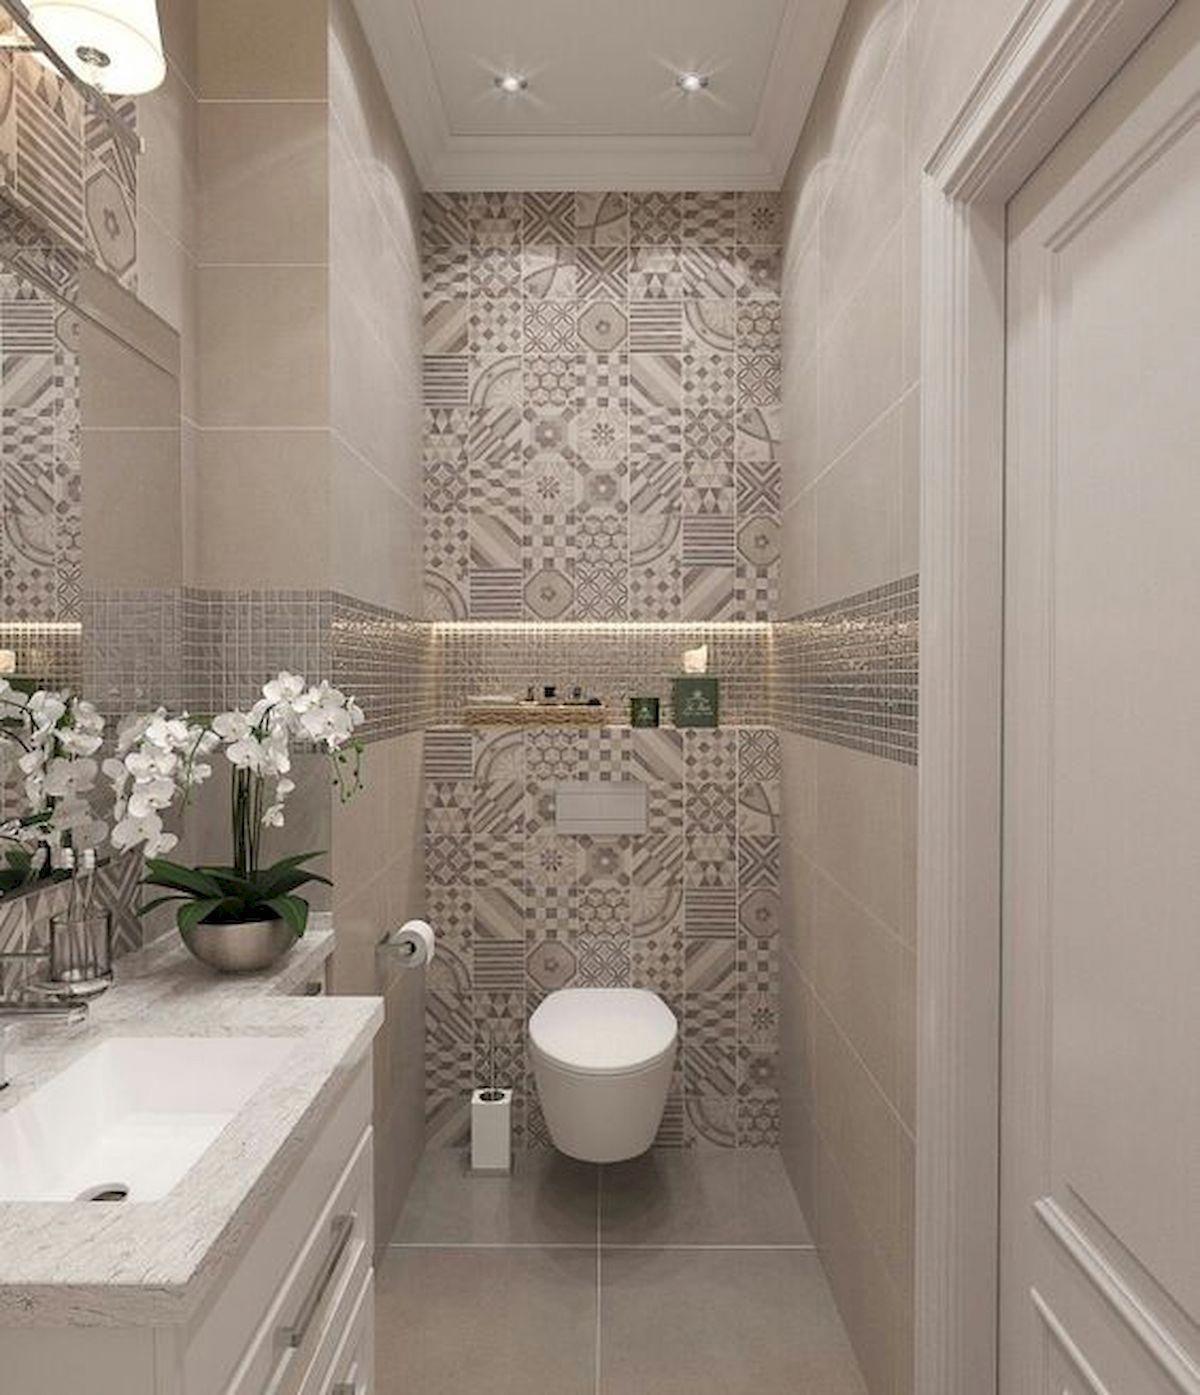 55 Fresh Small Master Bathroom Remodel Ideas And Design ...